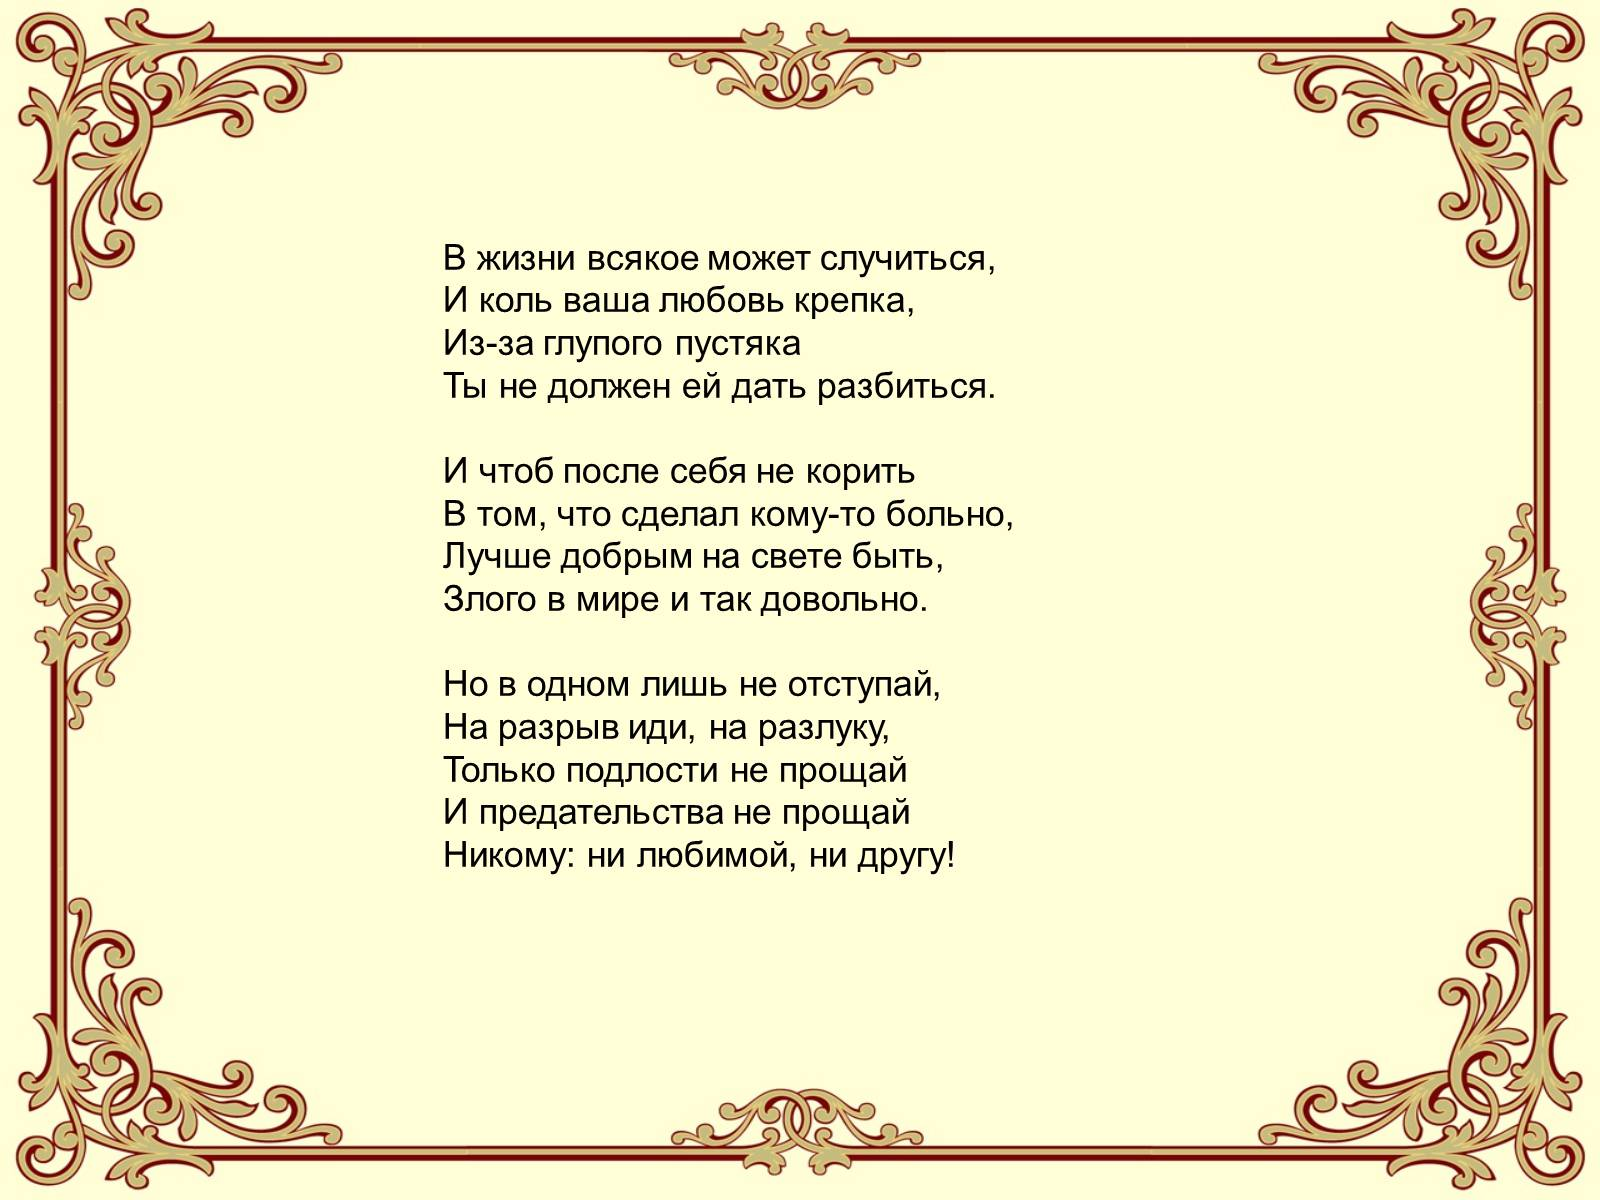 Дяде, стихи эдуарда асадова картинки